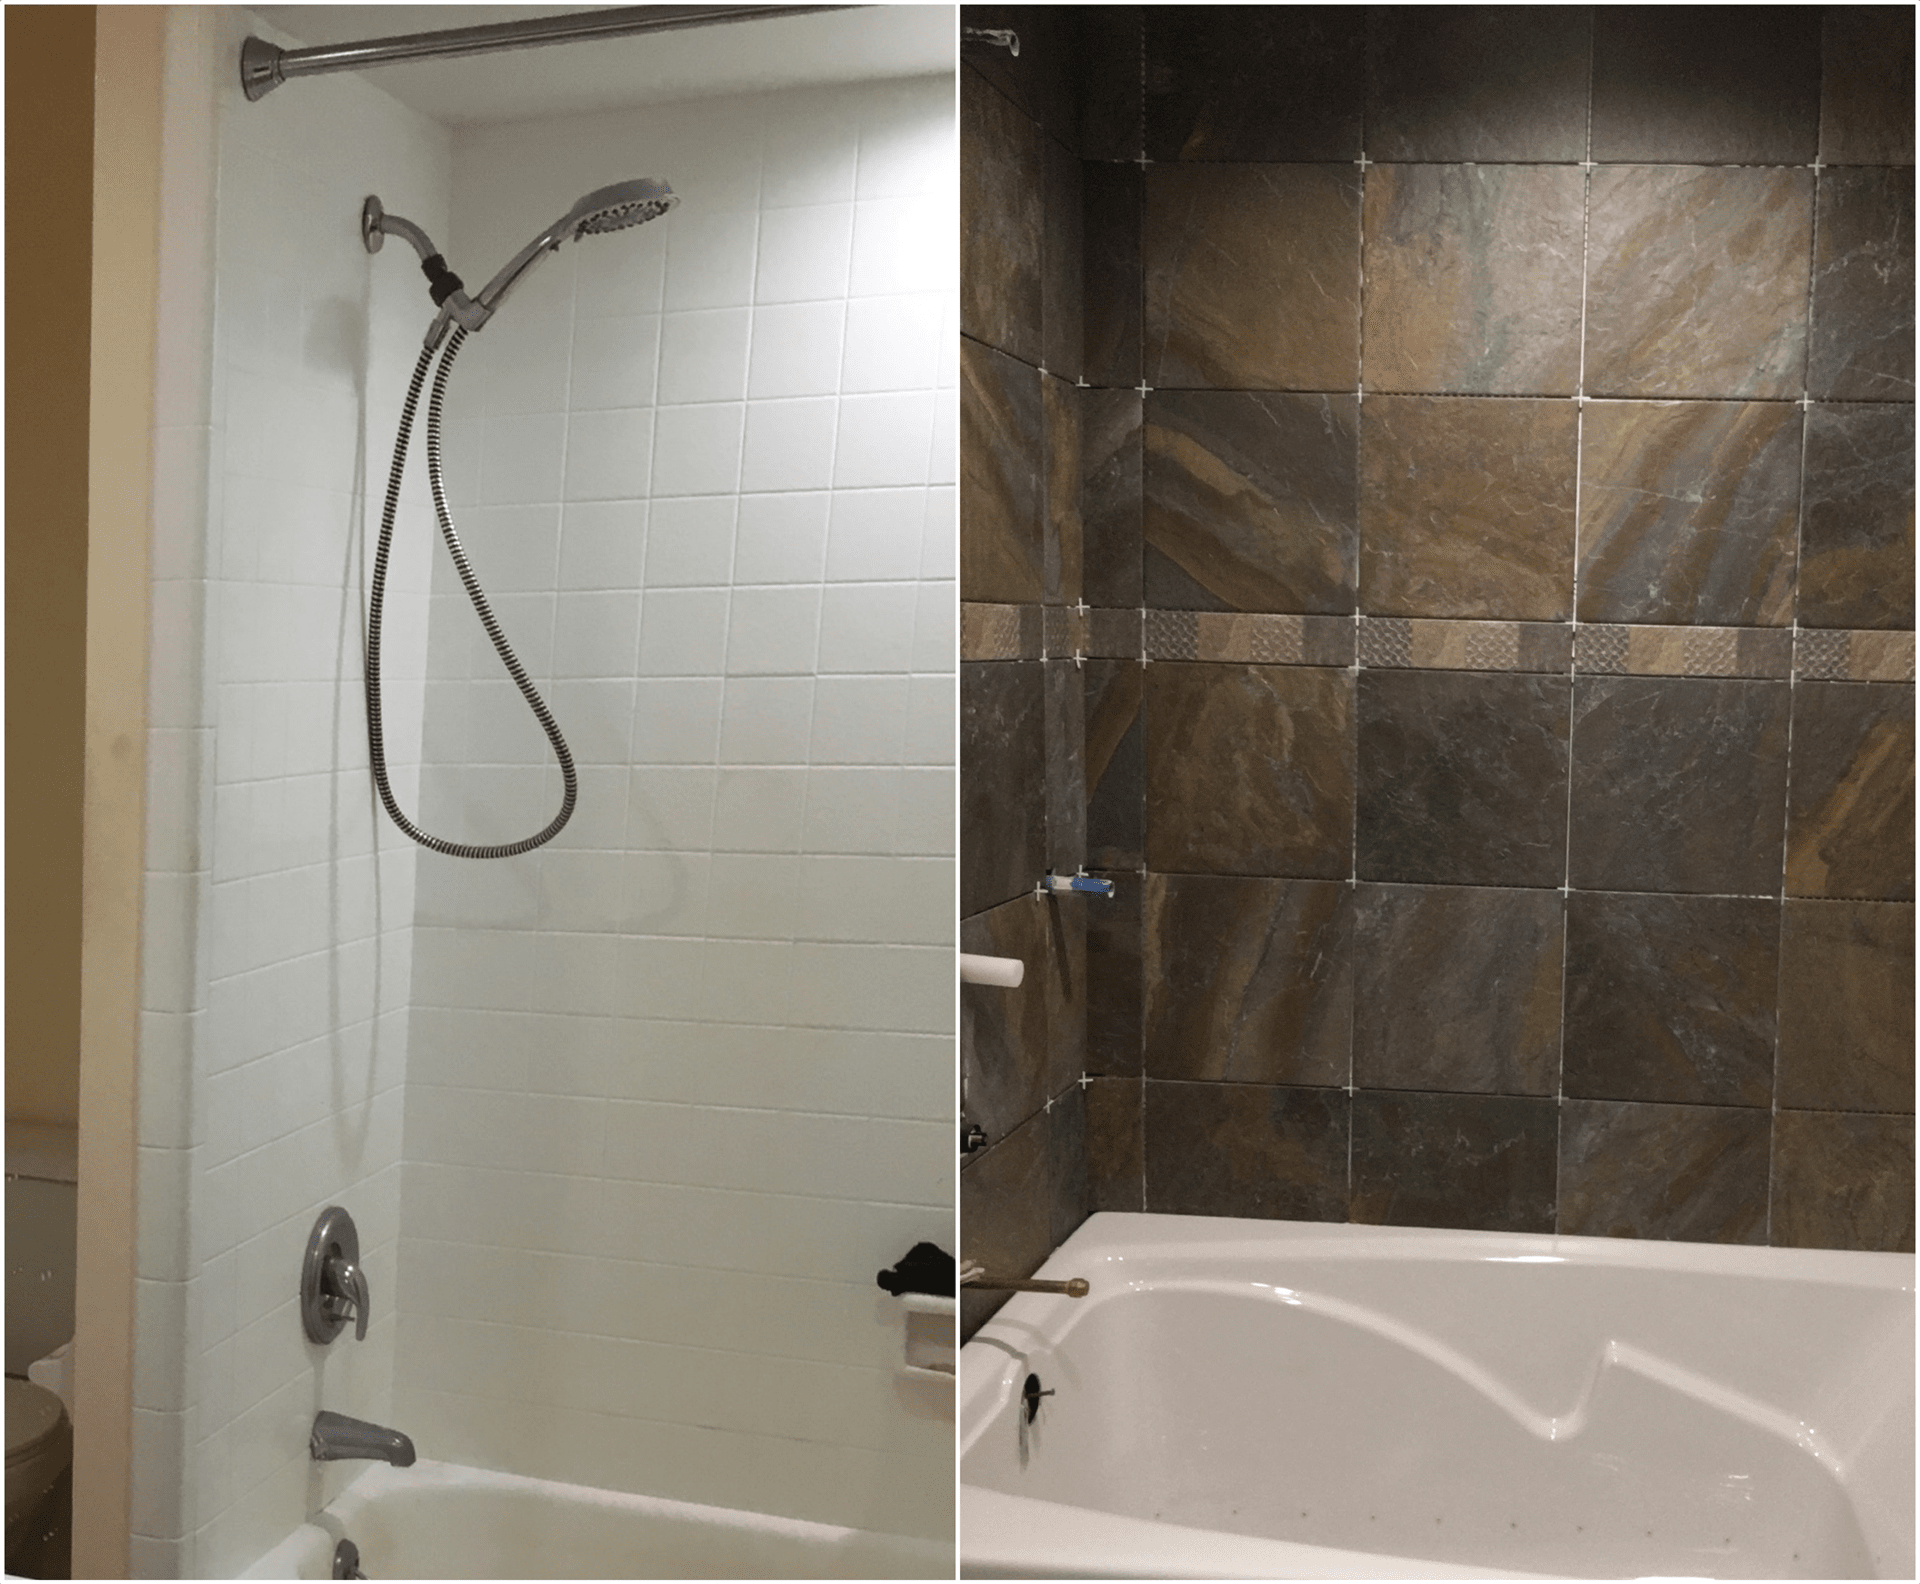 Bathroom tile installation in Jensen Beach, FL from Carpets Etc